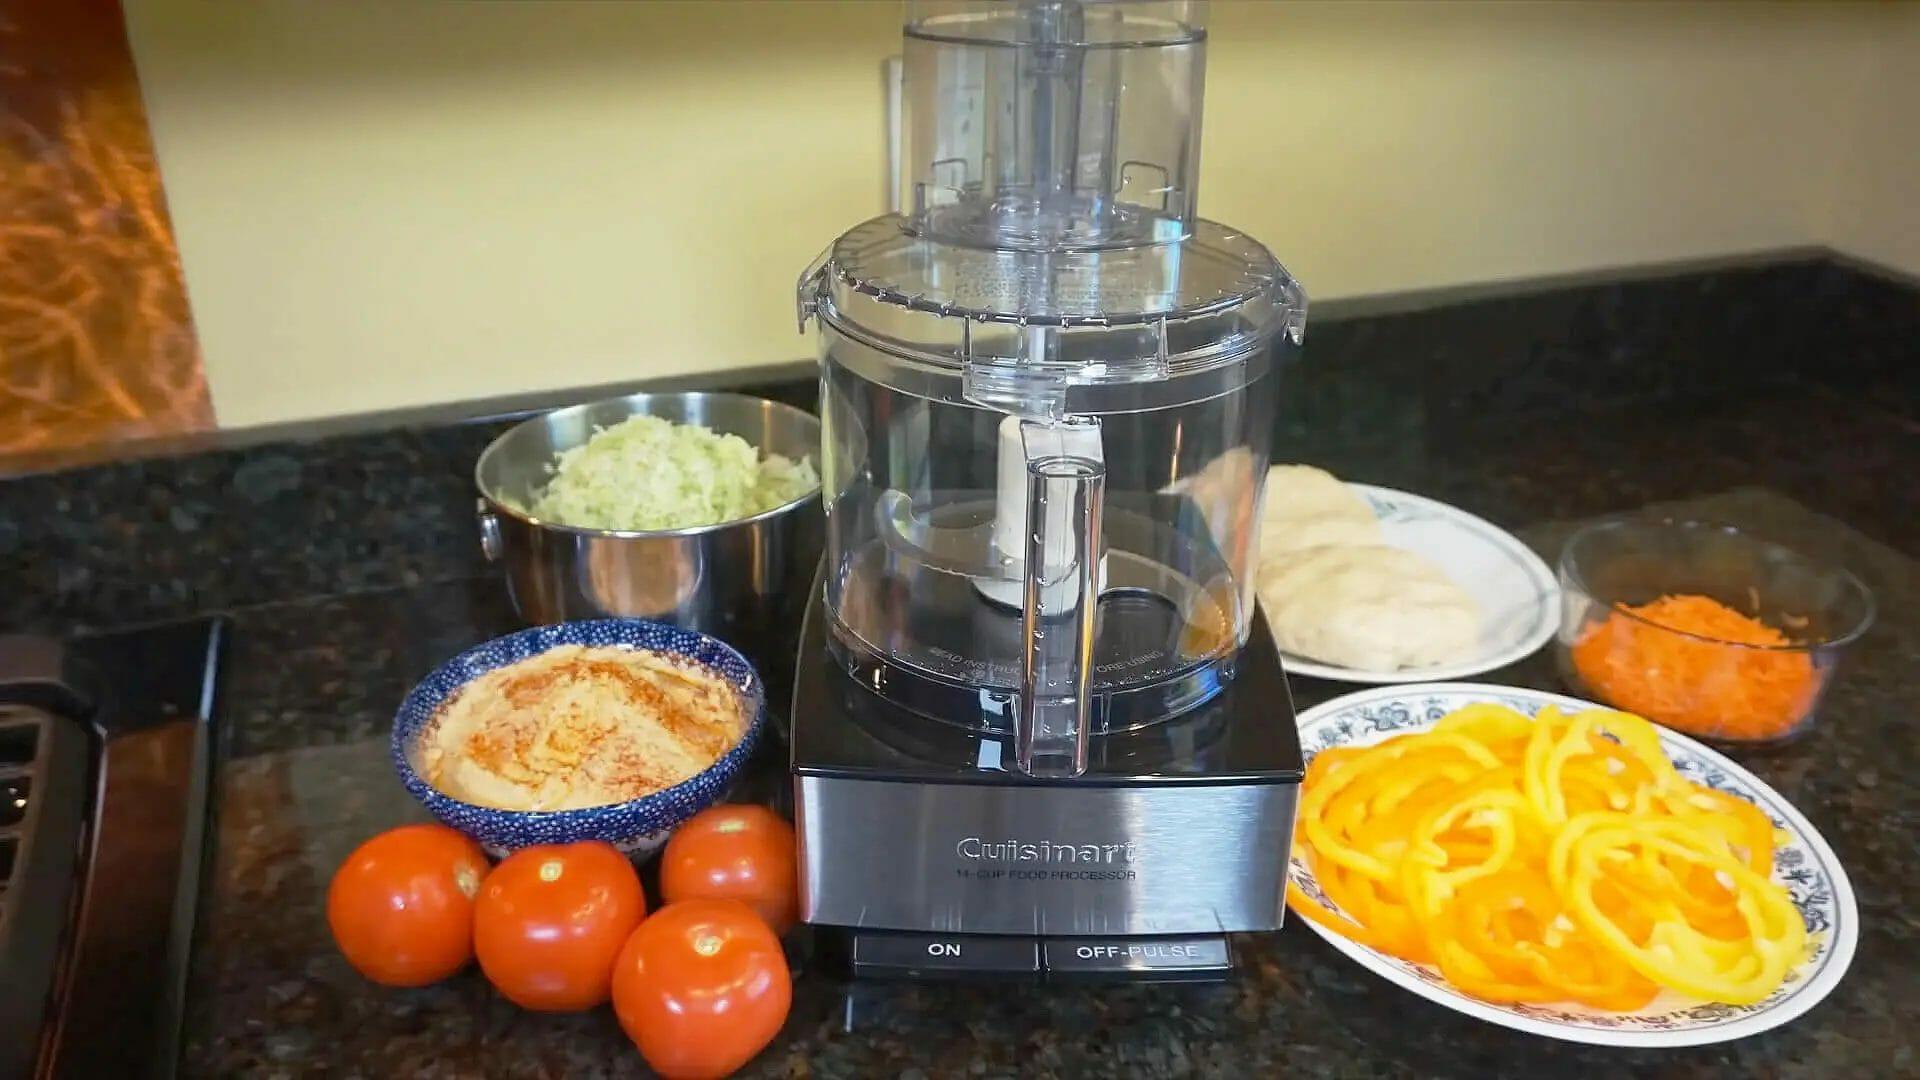 Review of Cuisinart DFP-14BCNY 14-Cup Food Processor